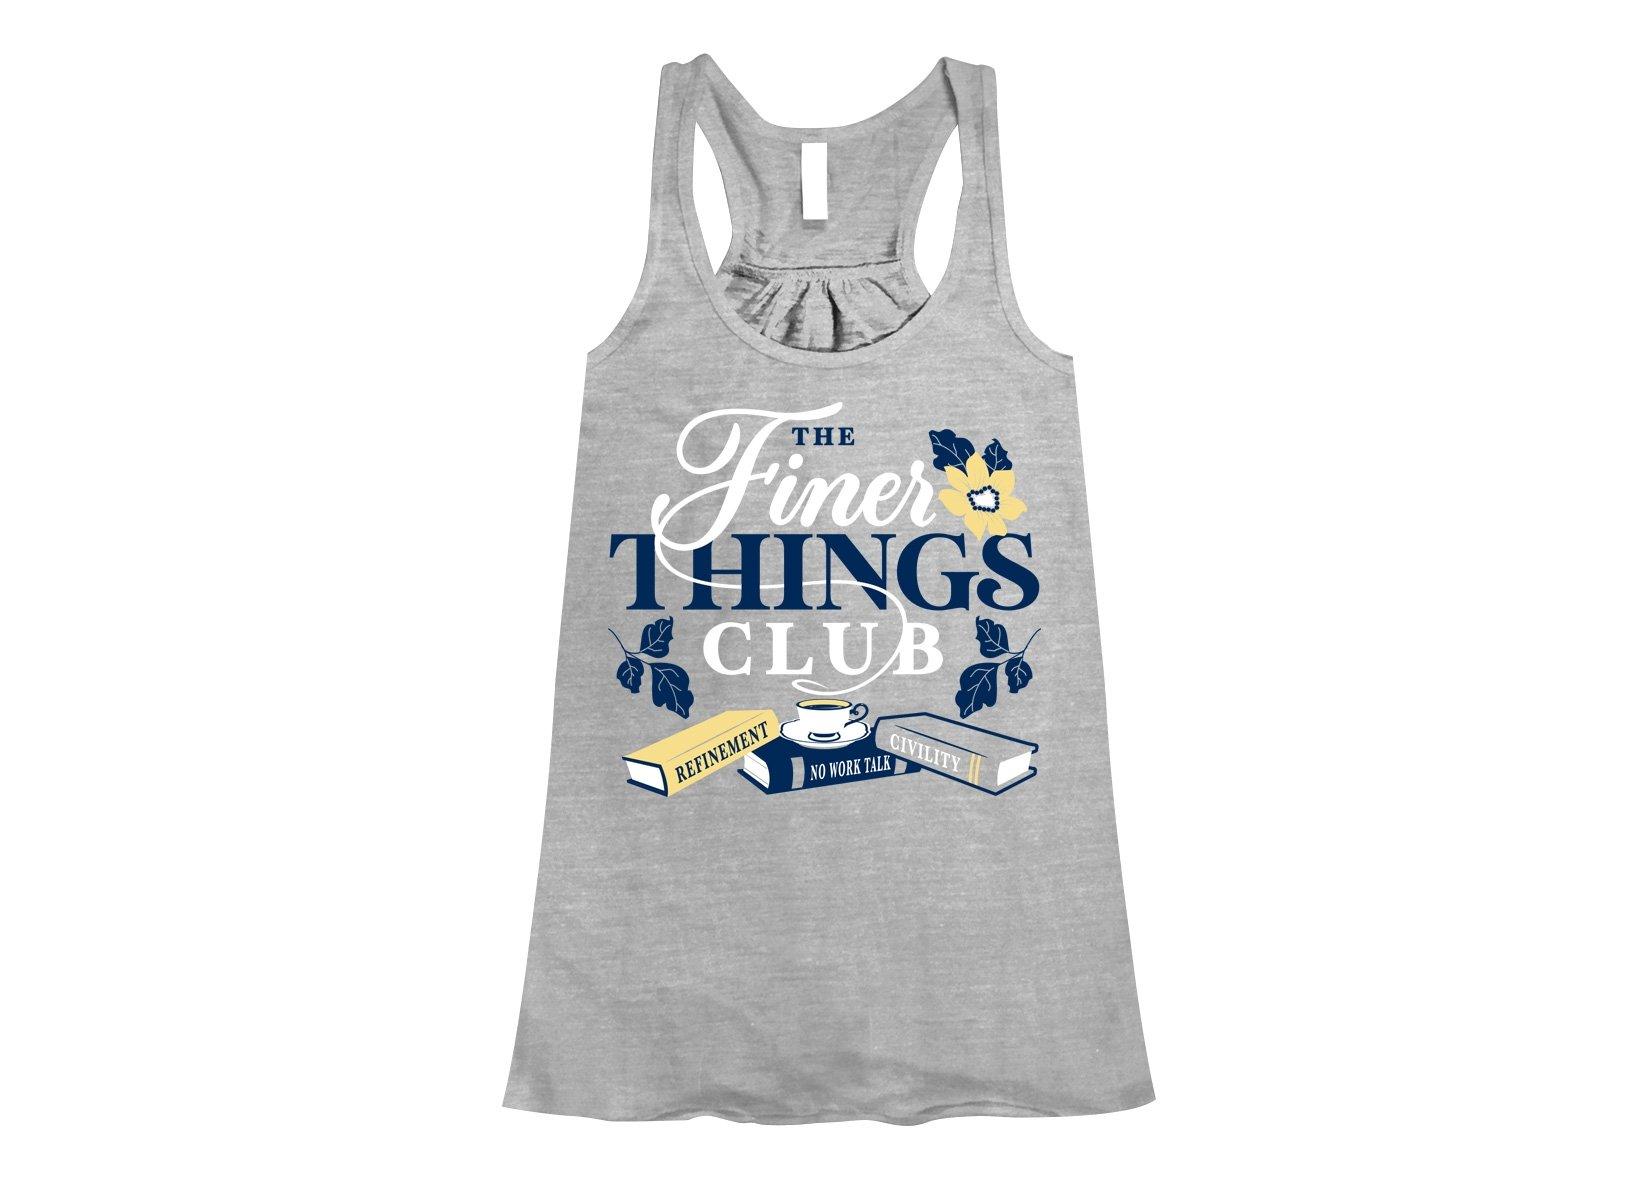 The Finer Things Club on Womens Tanks T-Shirt